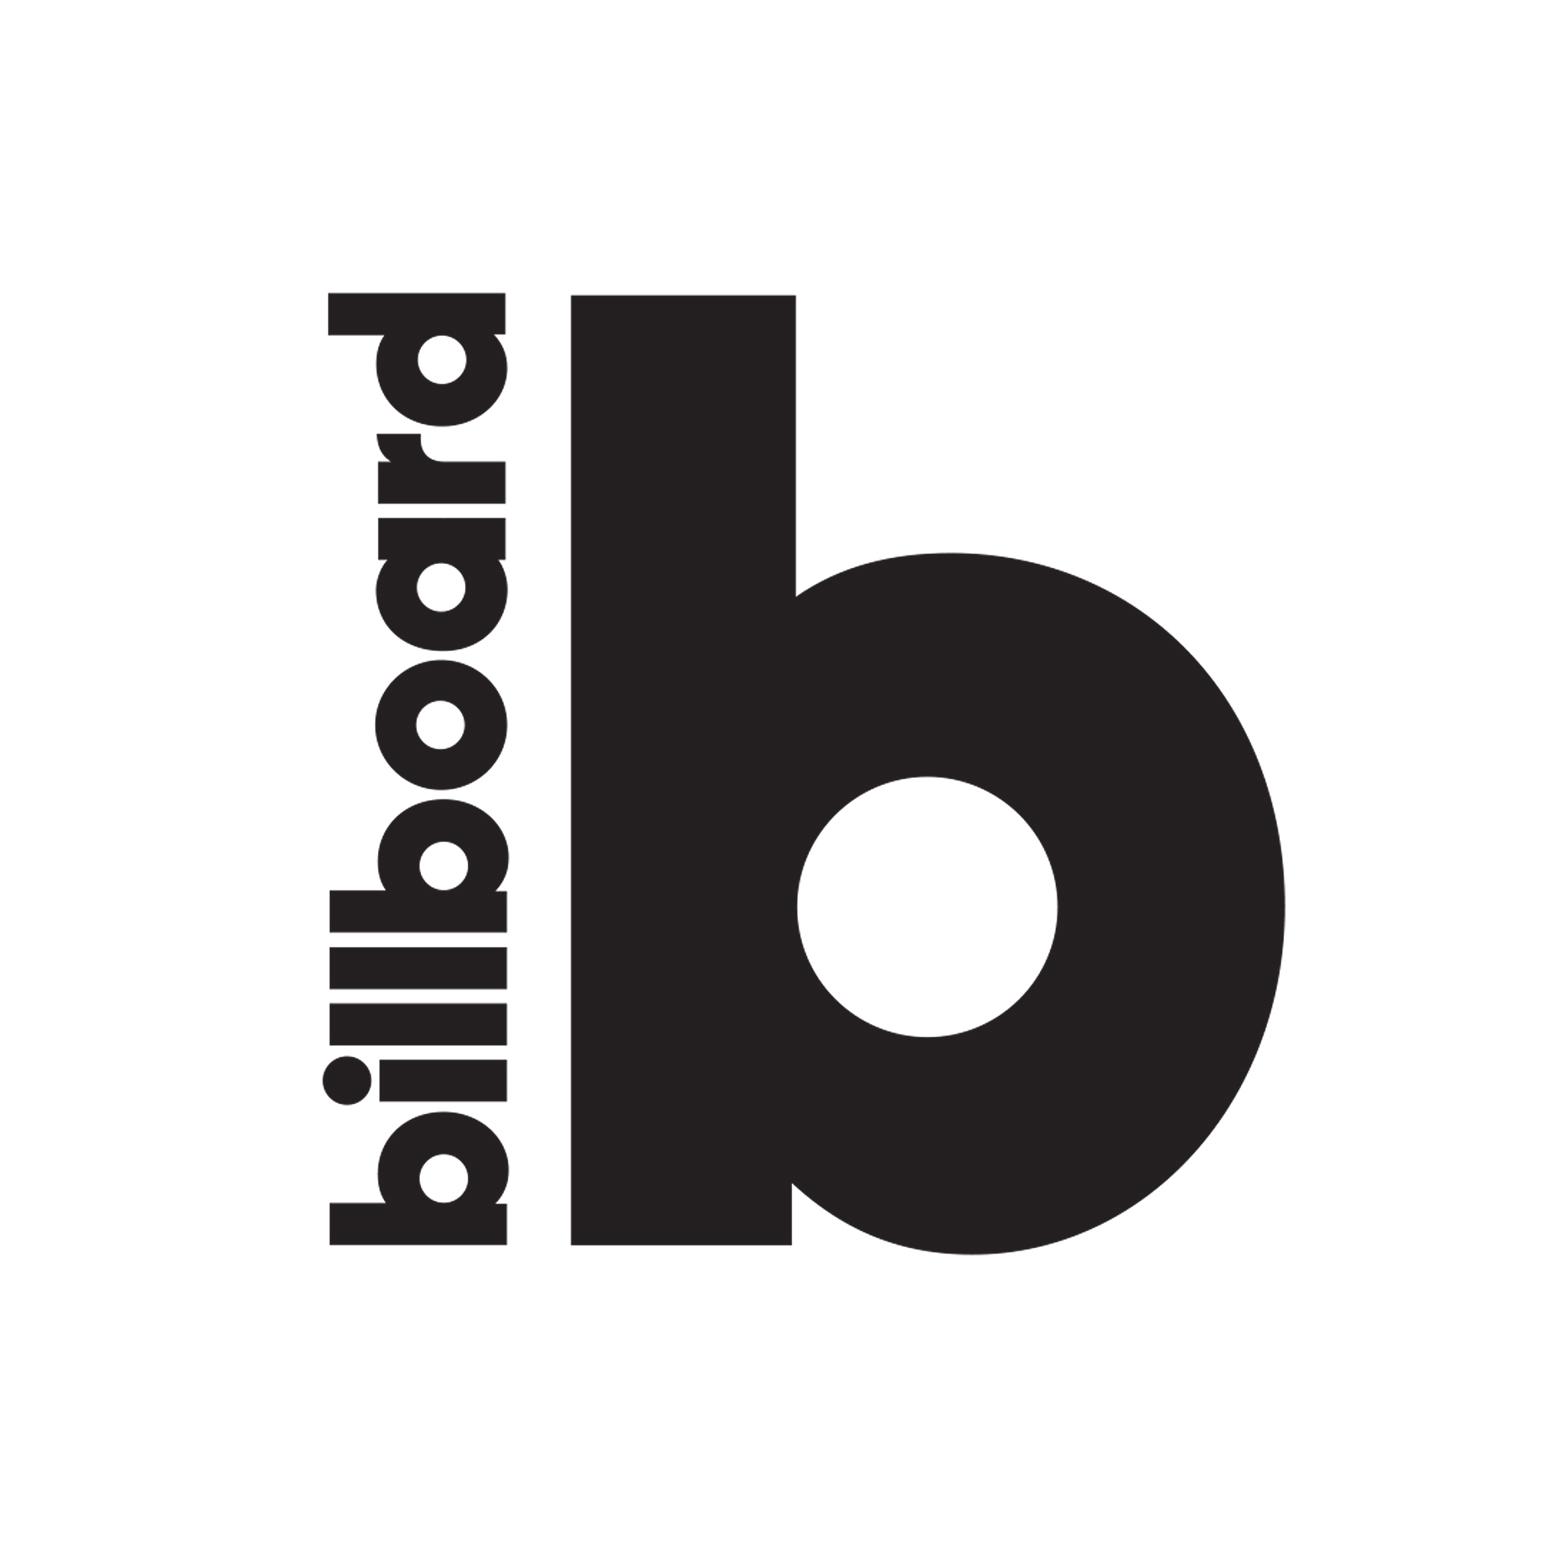 billboard-logo-2016-1548.jpg